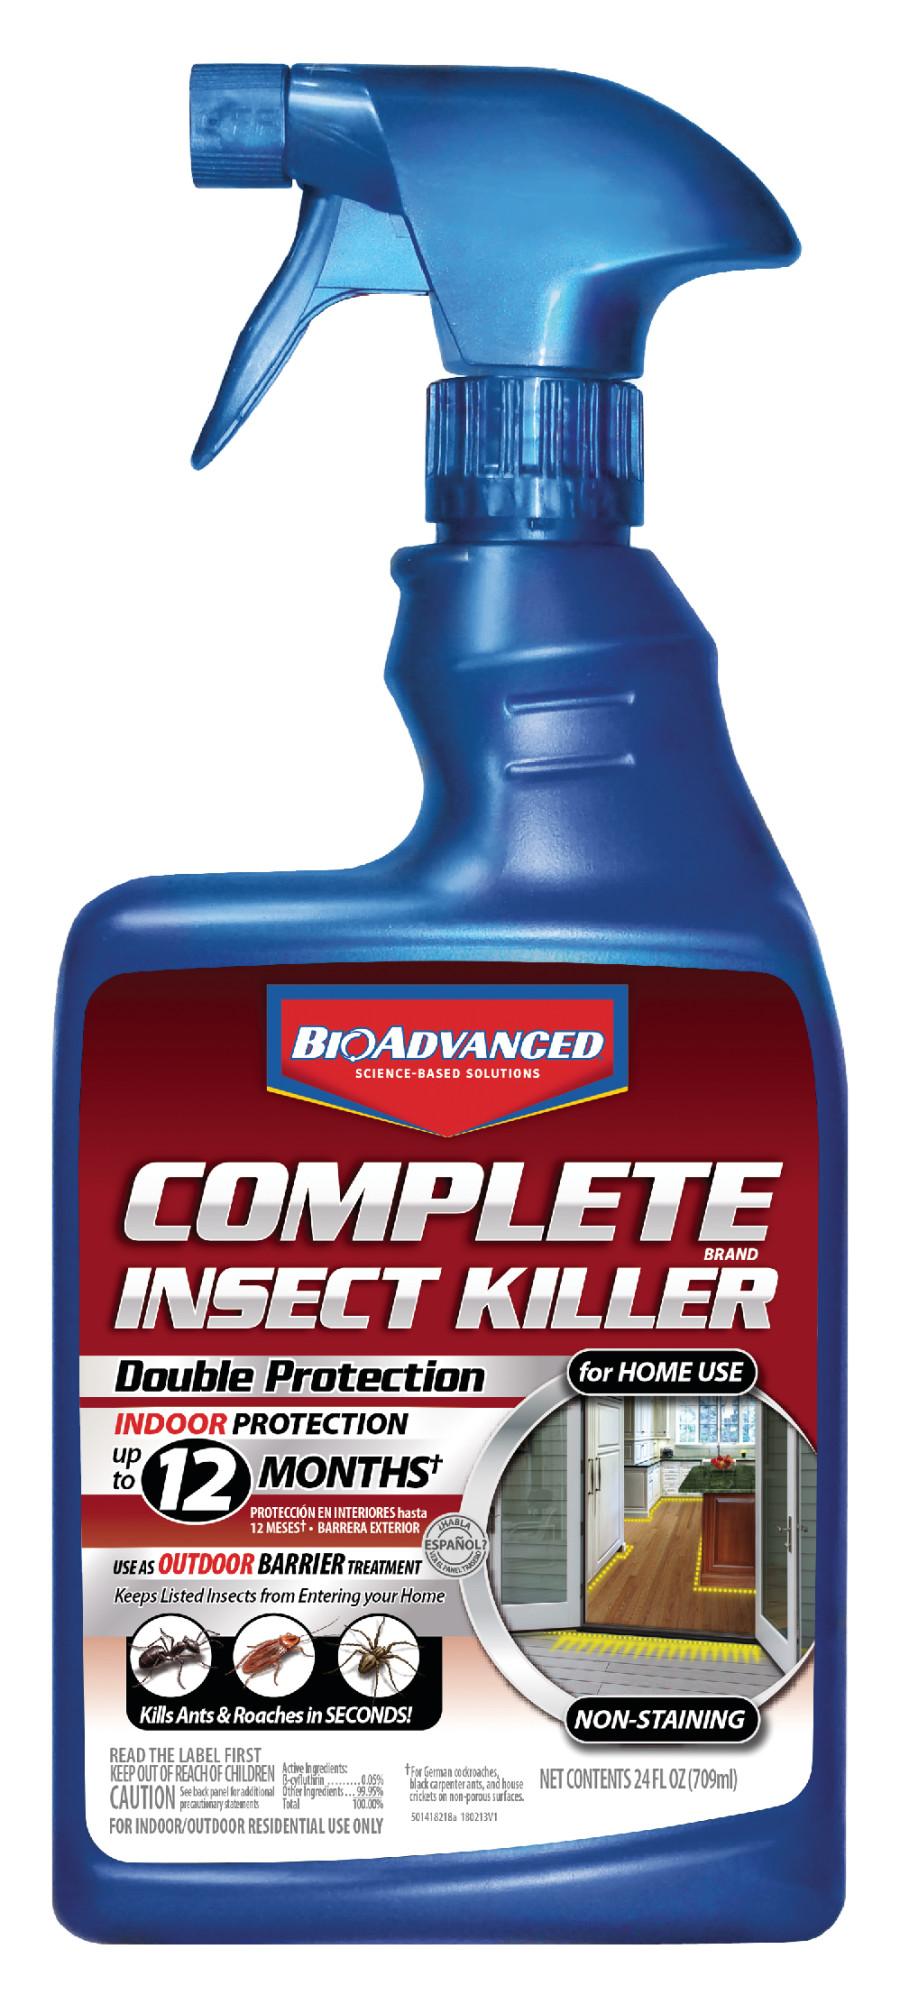 BioAdvanced Complete Home Pest Control Ready to Use 12ea/24 fl oz